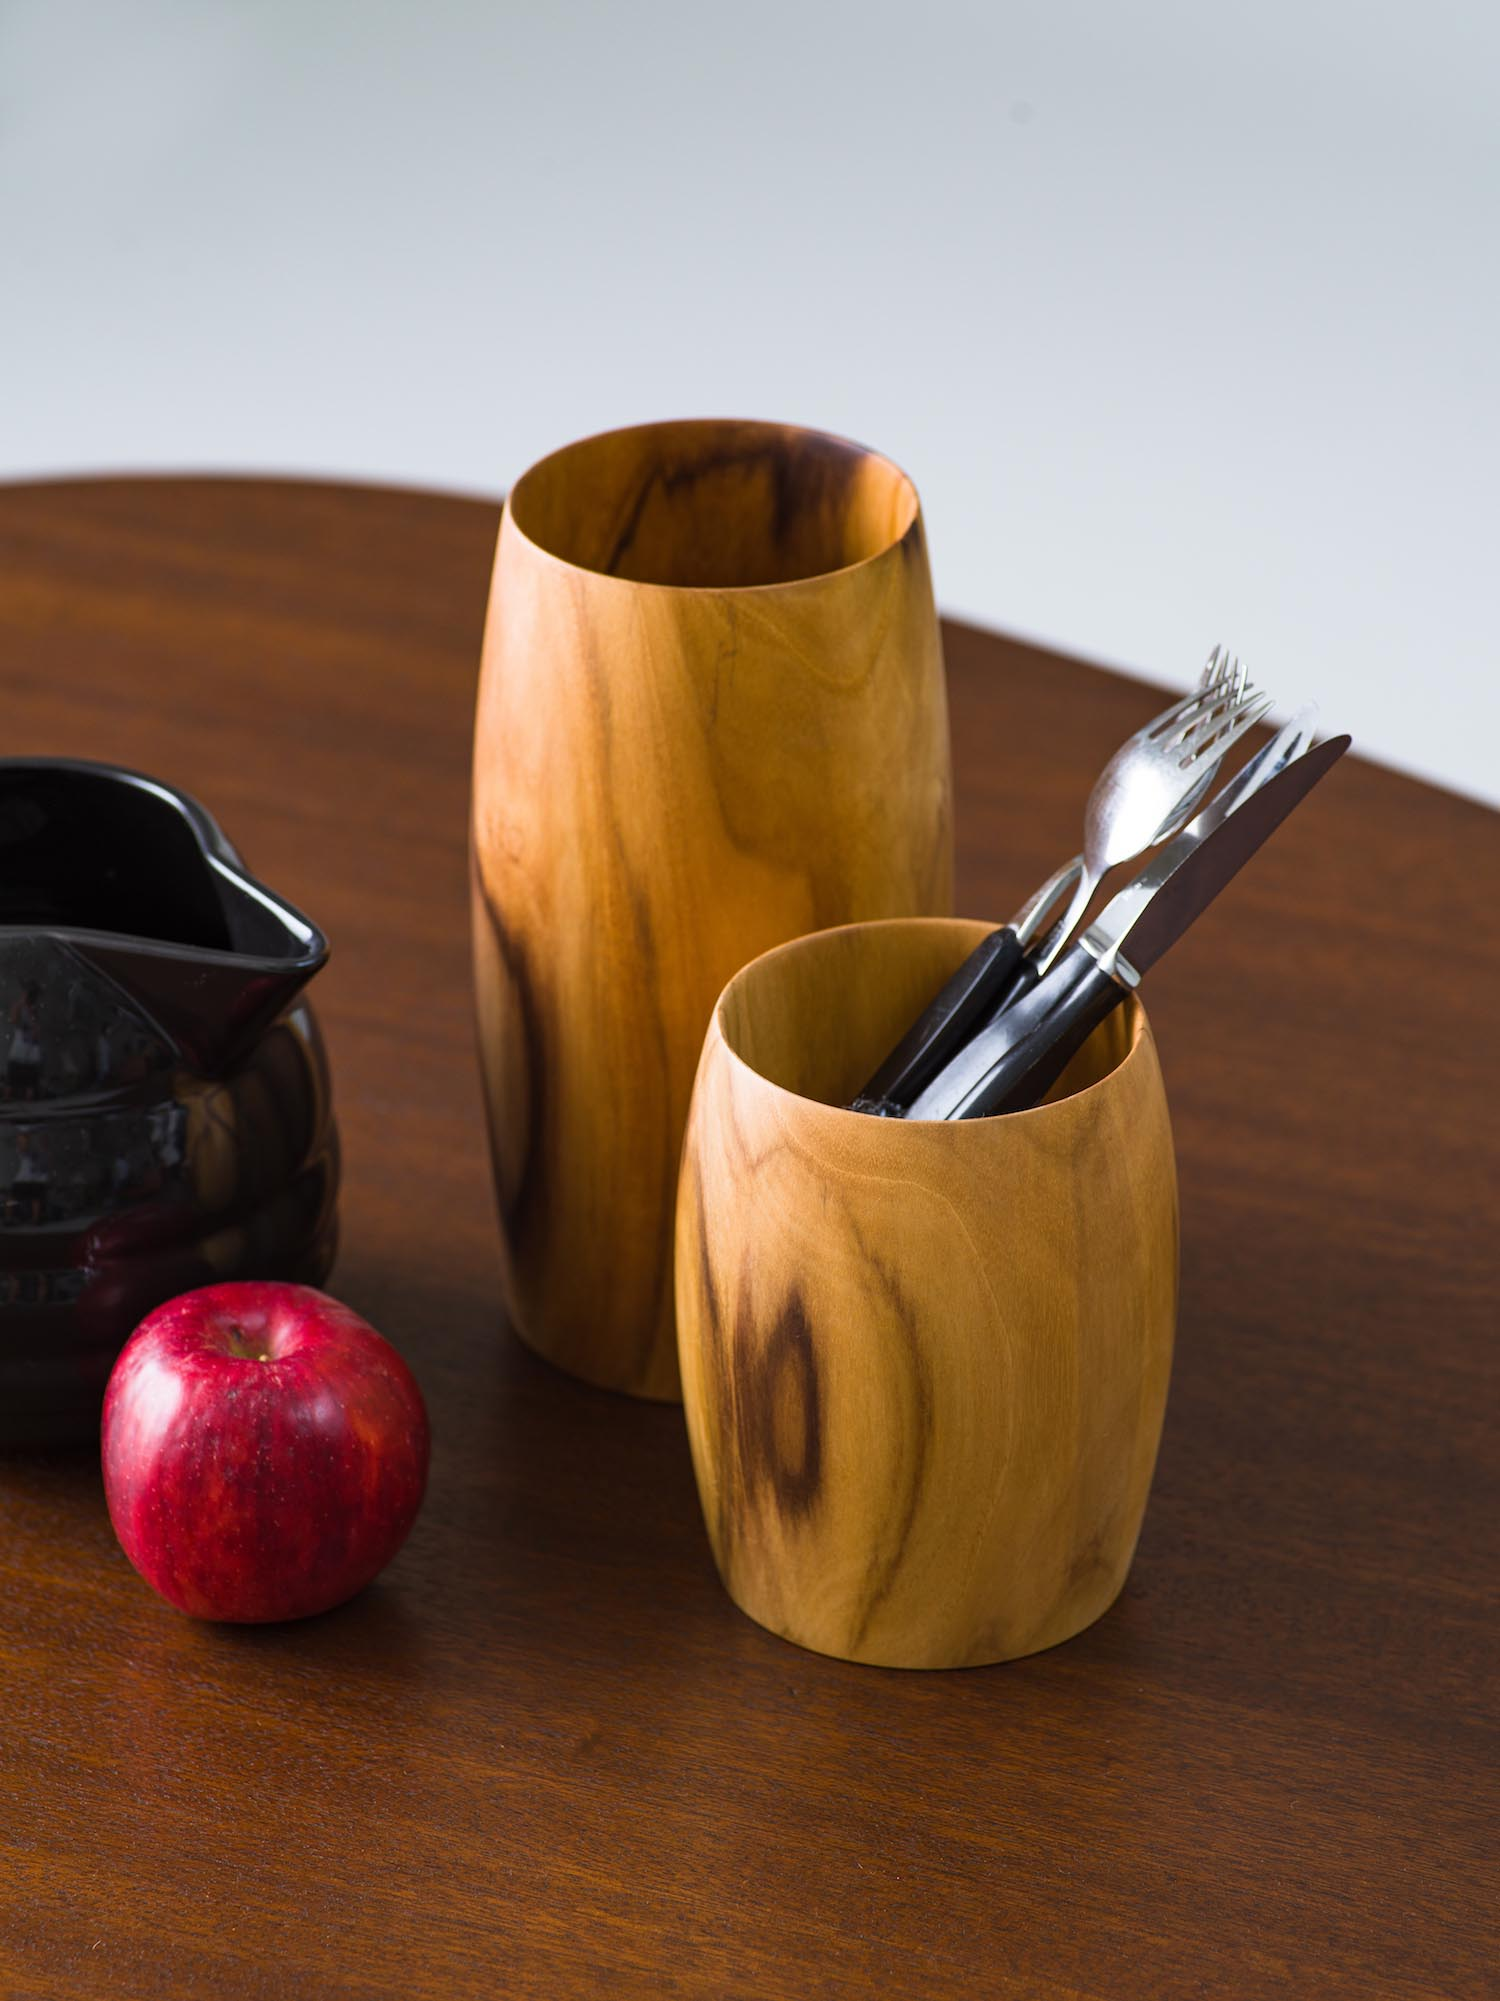 17 vase(S) ¥9,350 vase(L) ¥18,700